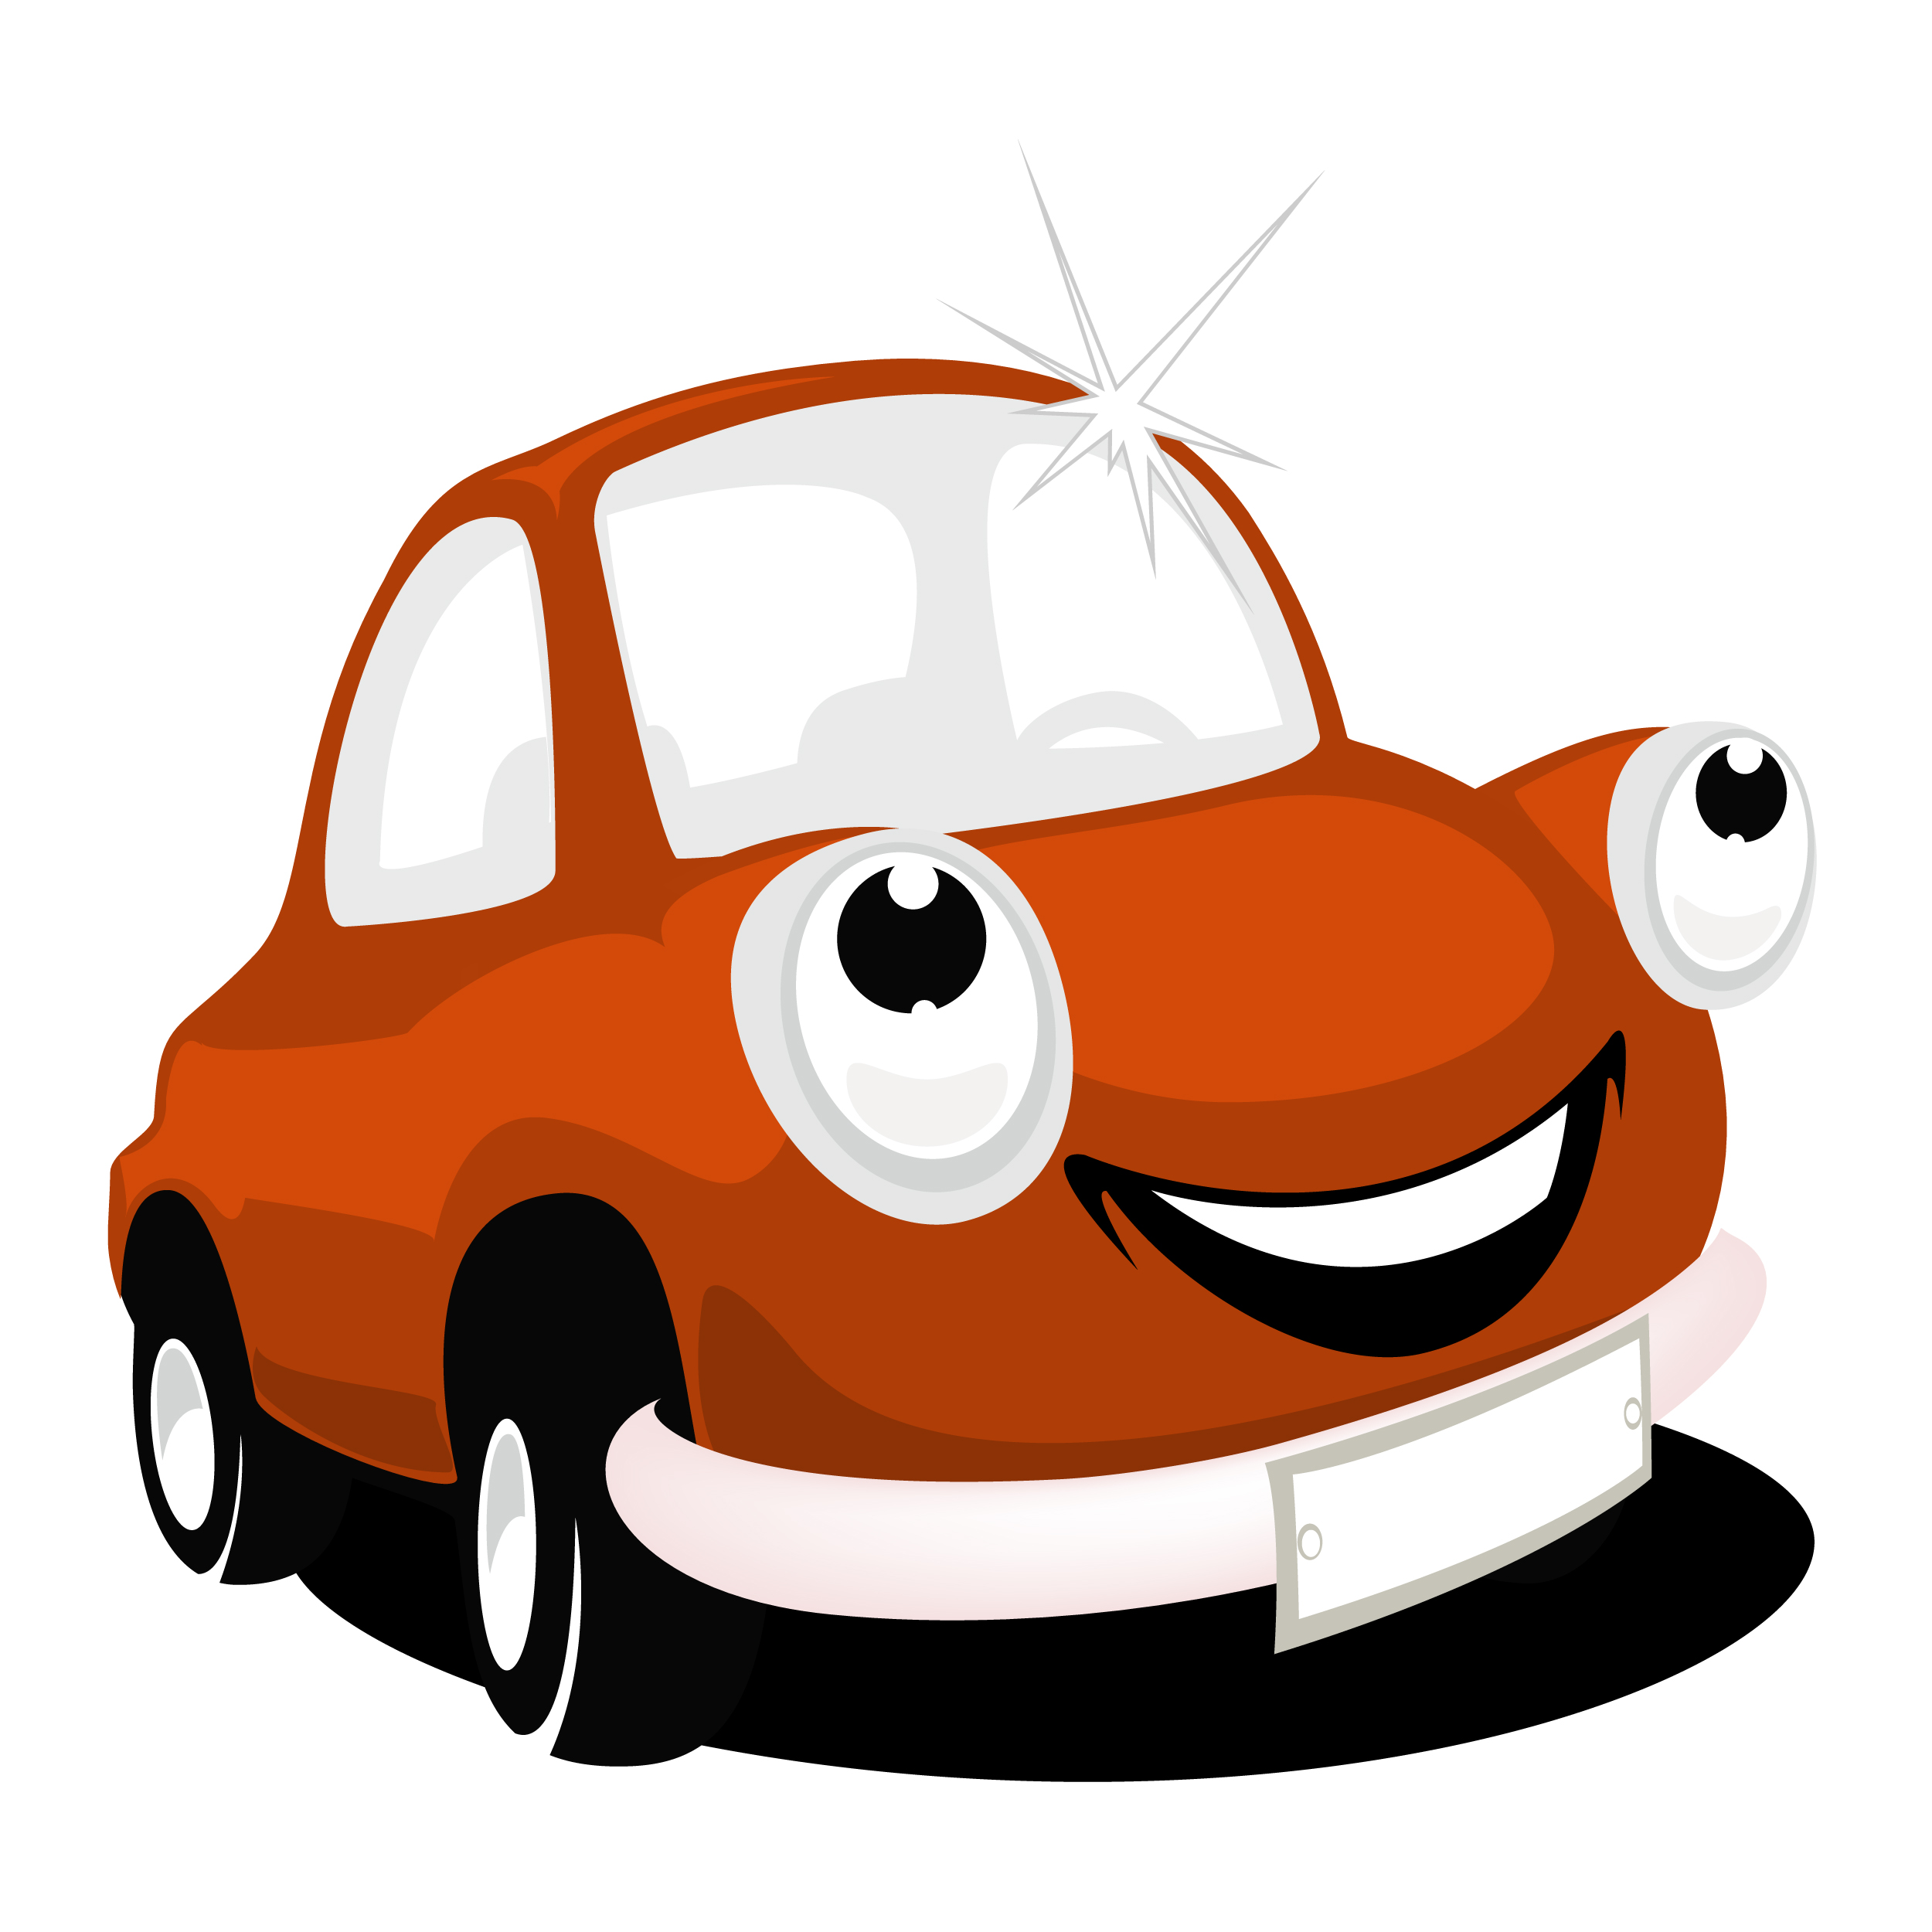 Uncategorized Cars Cartoon picture of cars the cartoon car pictures cartoon